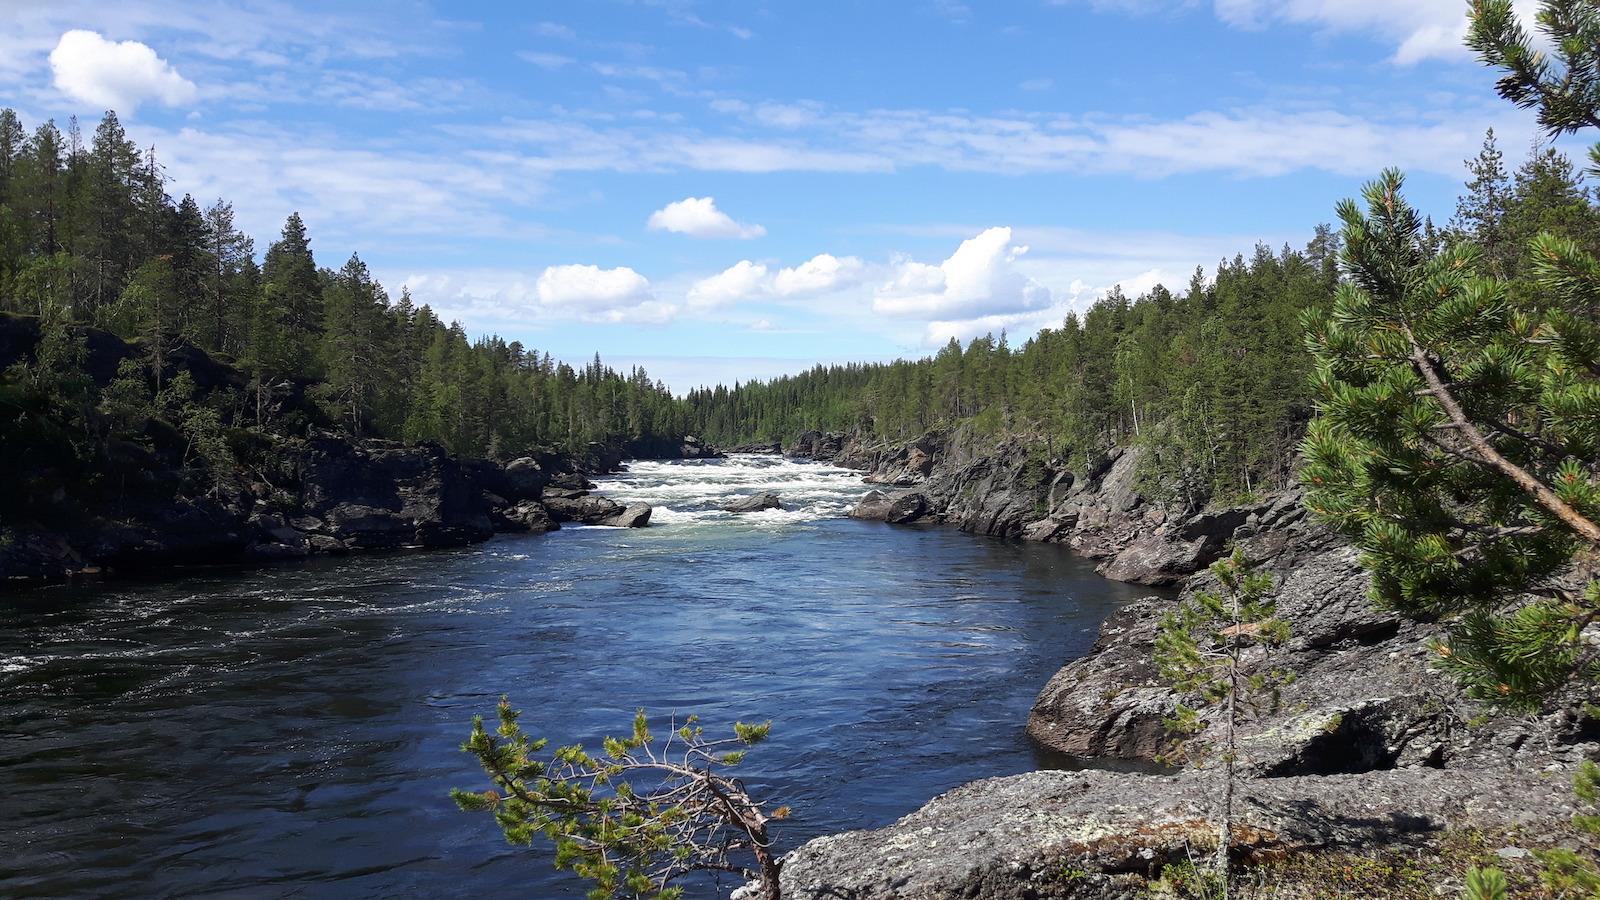 Kalix Alven near Masugnsbyn Sweden